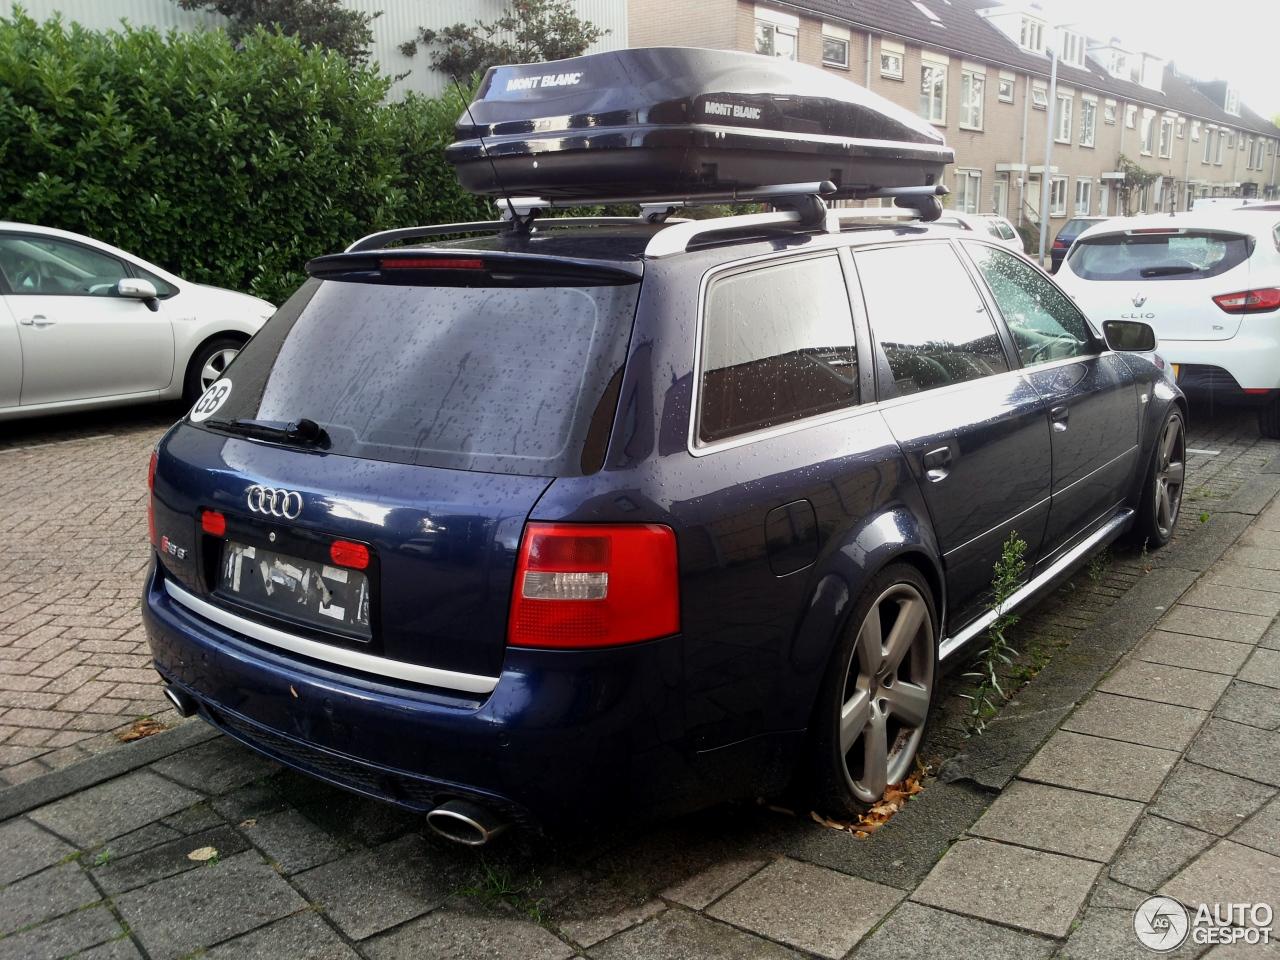 Audi Rs6 Avant C5 16 September 2013 Autogespot